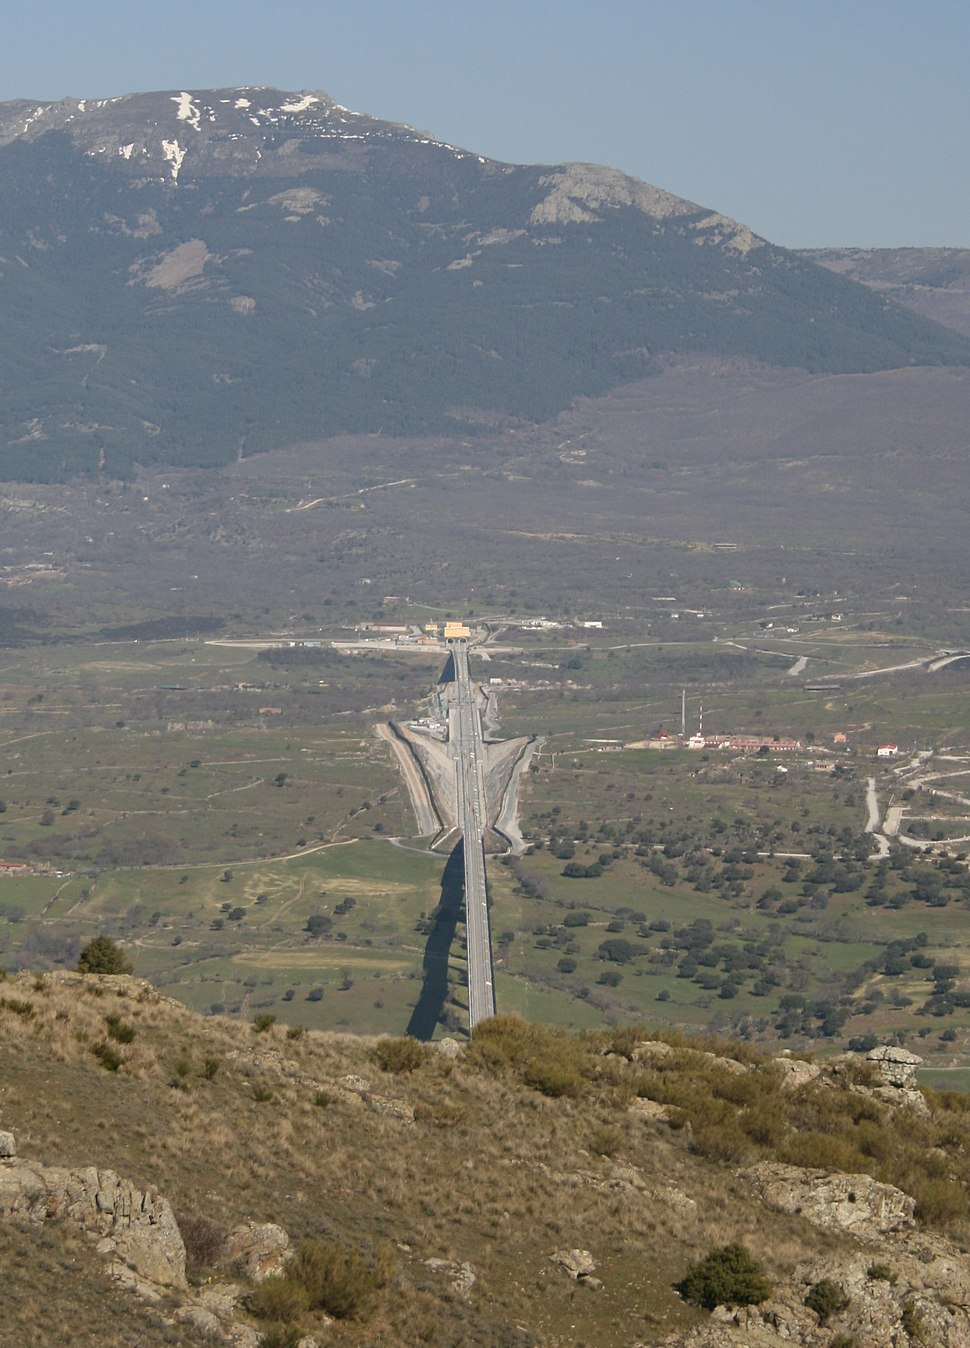 Tunel de san pedro ColmenarViejo Spain